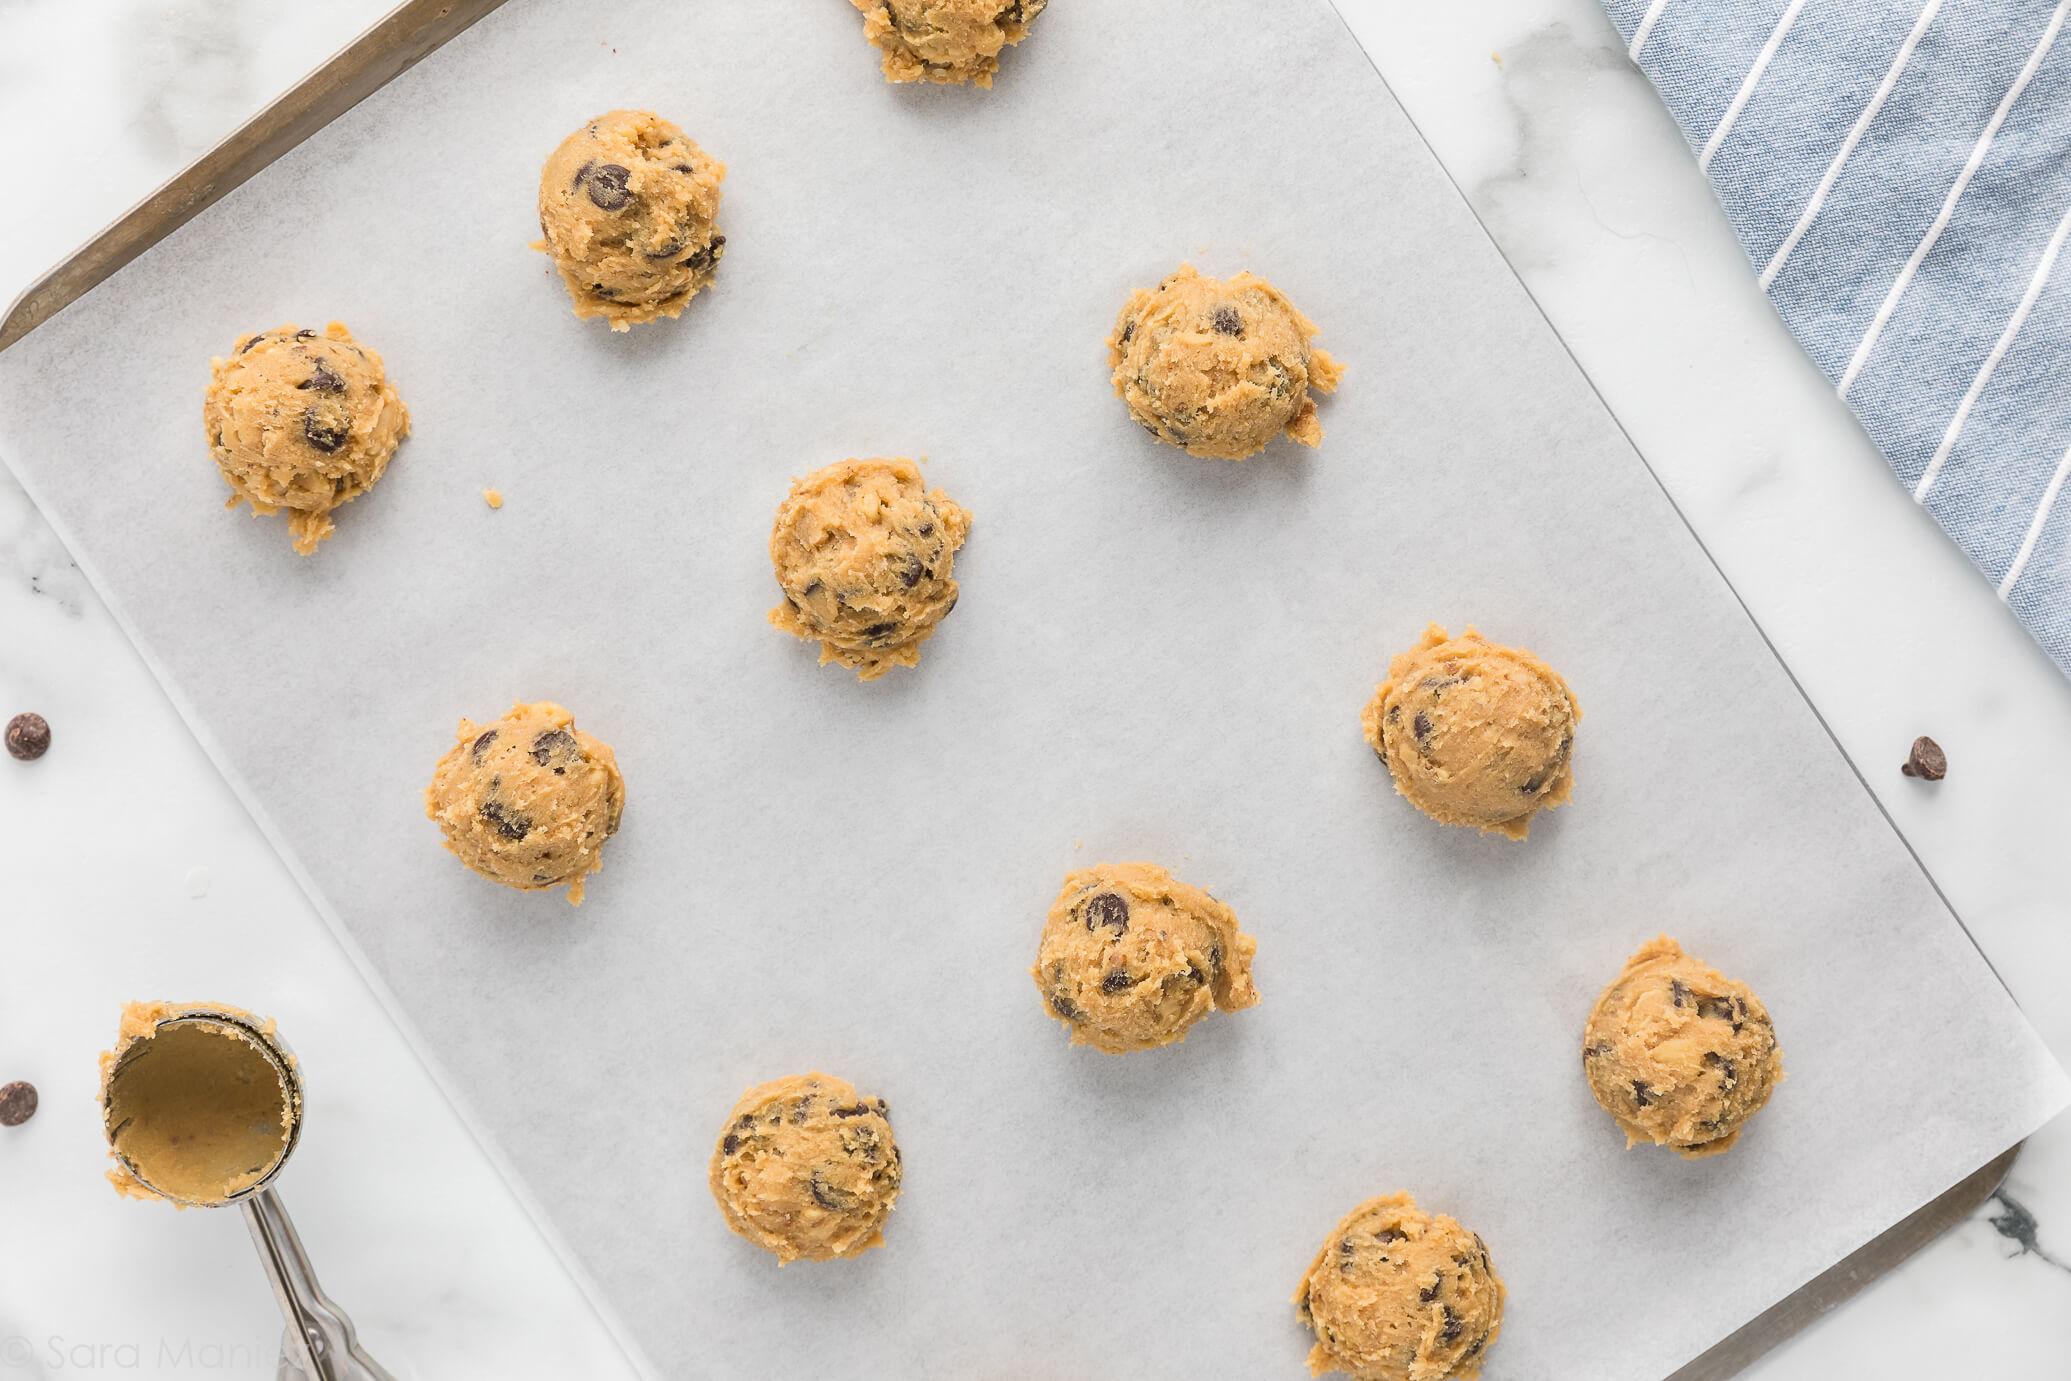 Chocolate Chip Cookies dough balls